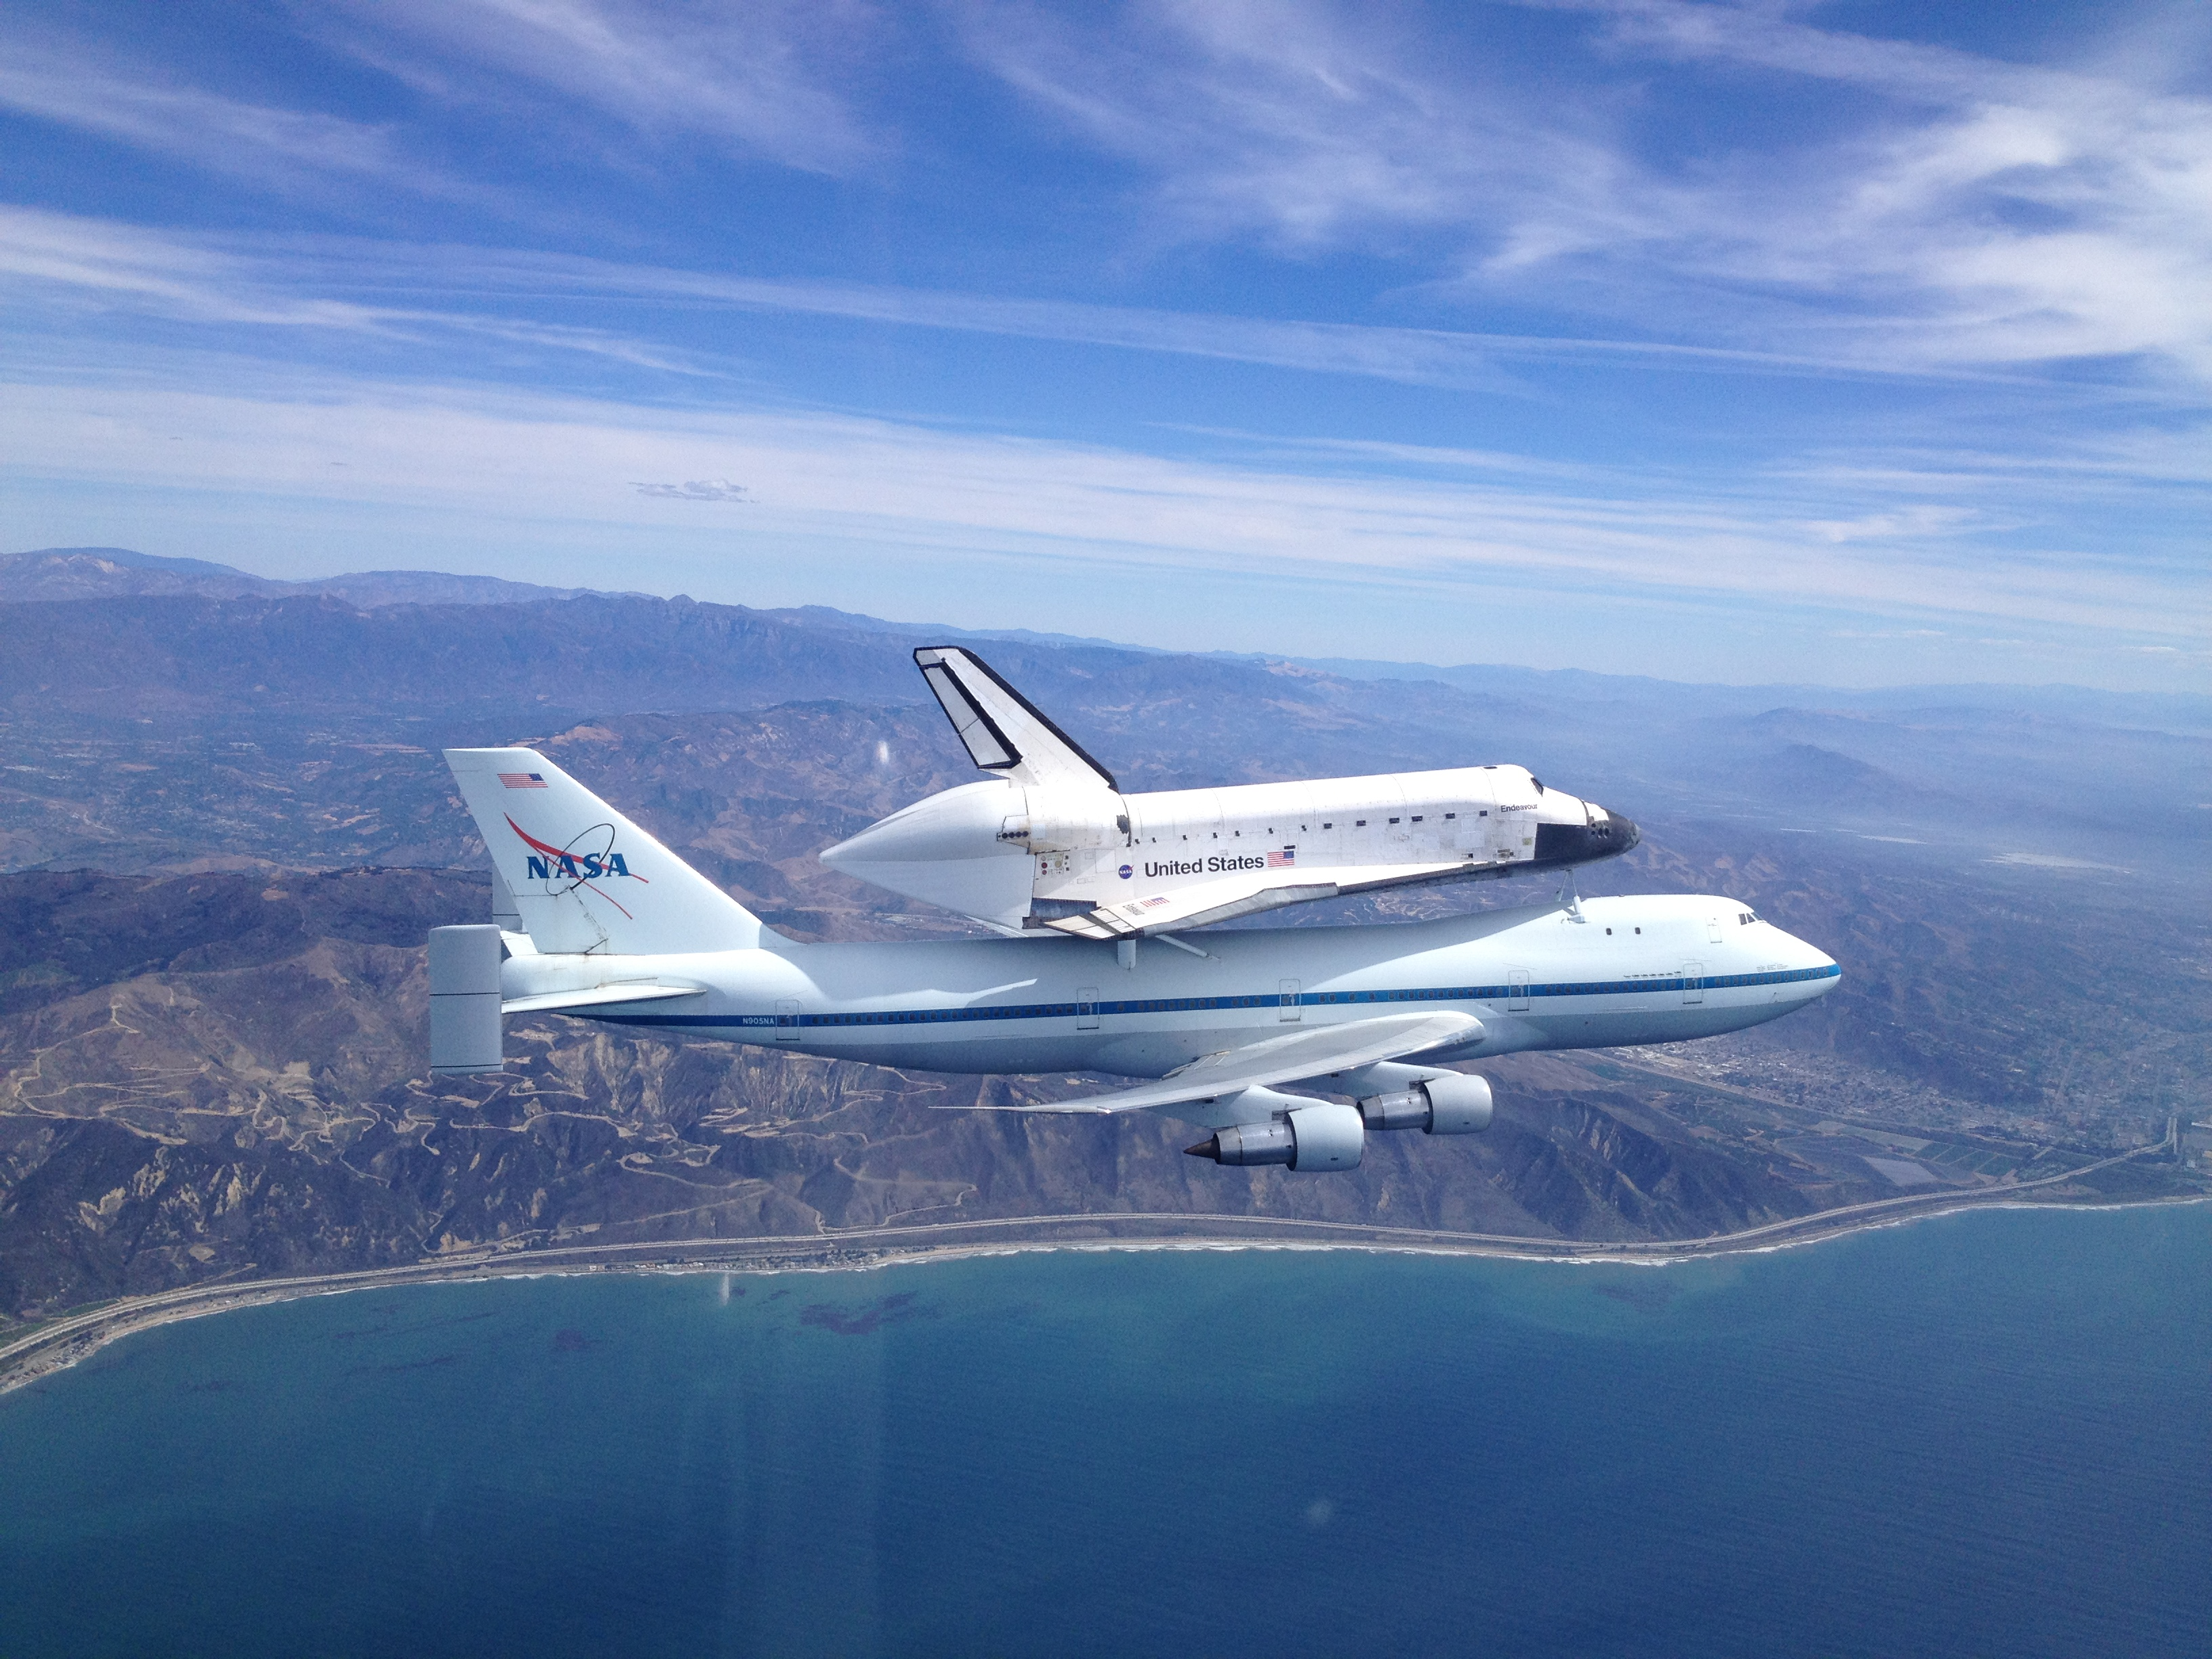 space shuttle endeavour size - photo #47